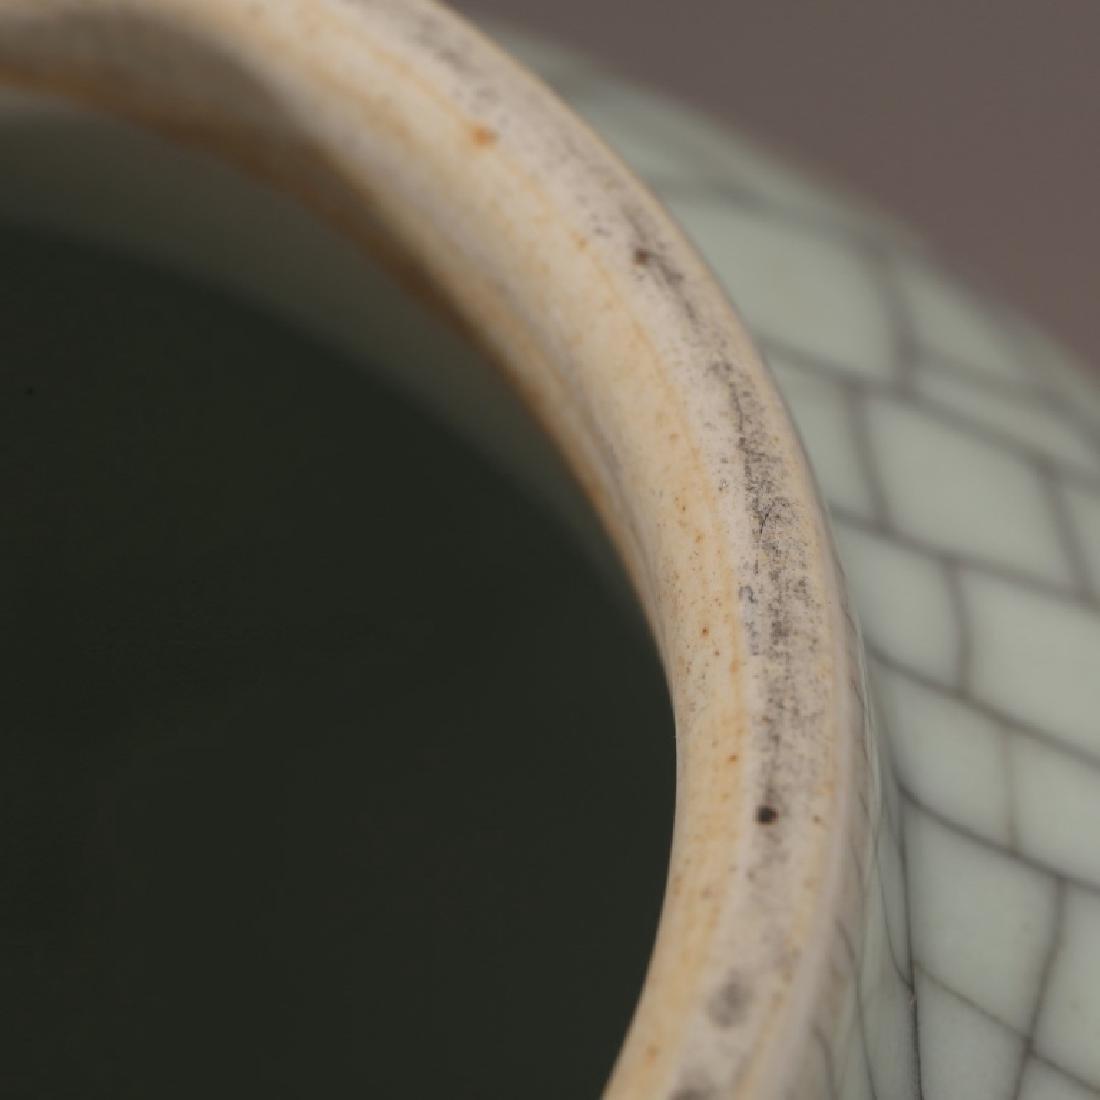 Chinese 19 C Guanyao Crackle Glaze Porcelain Jar - 3